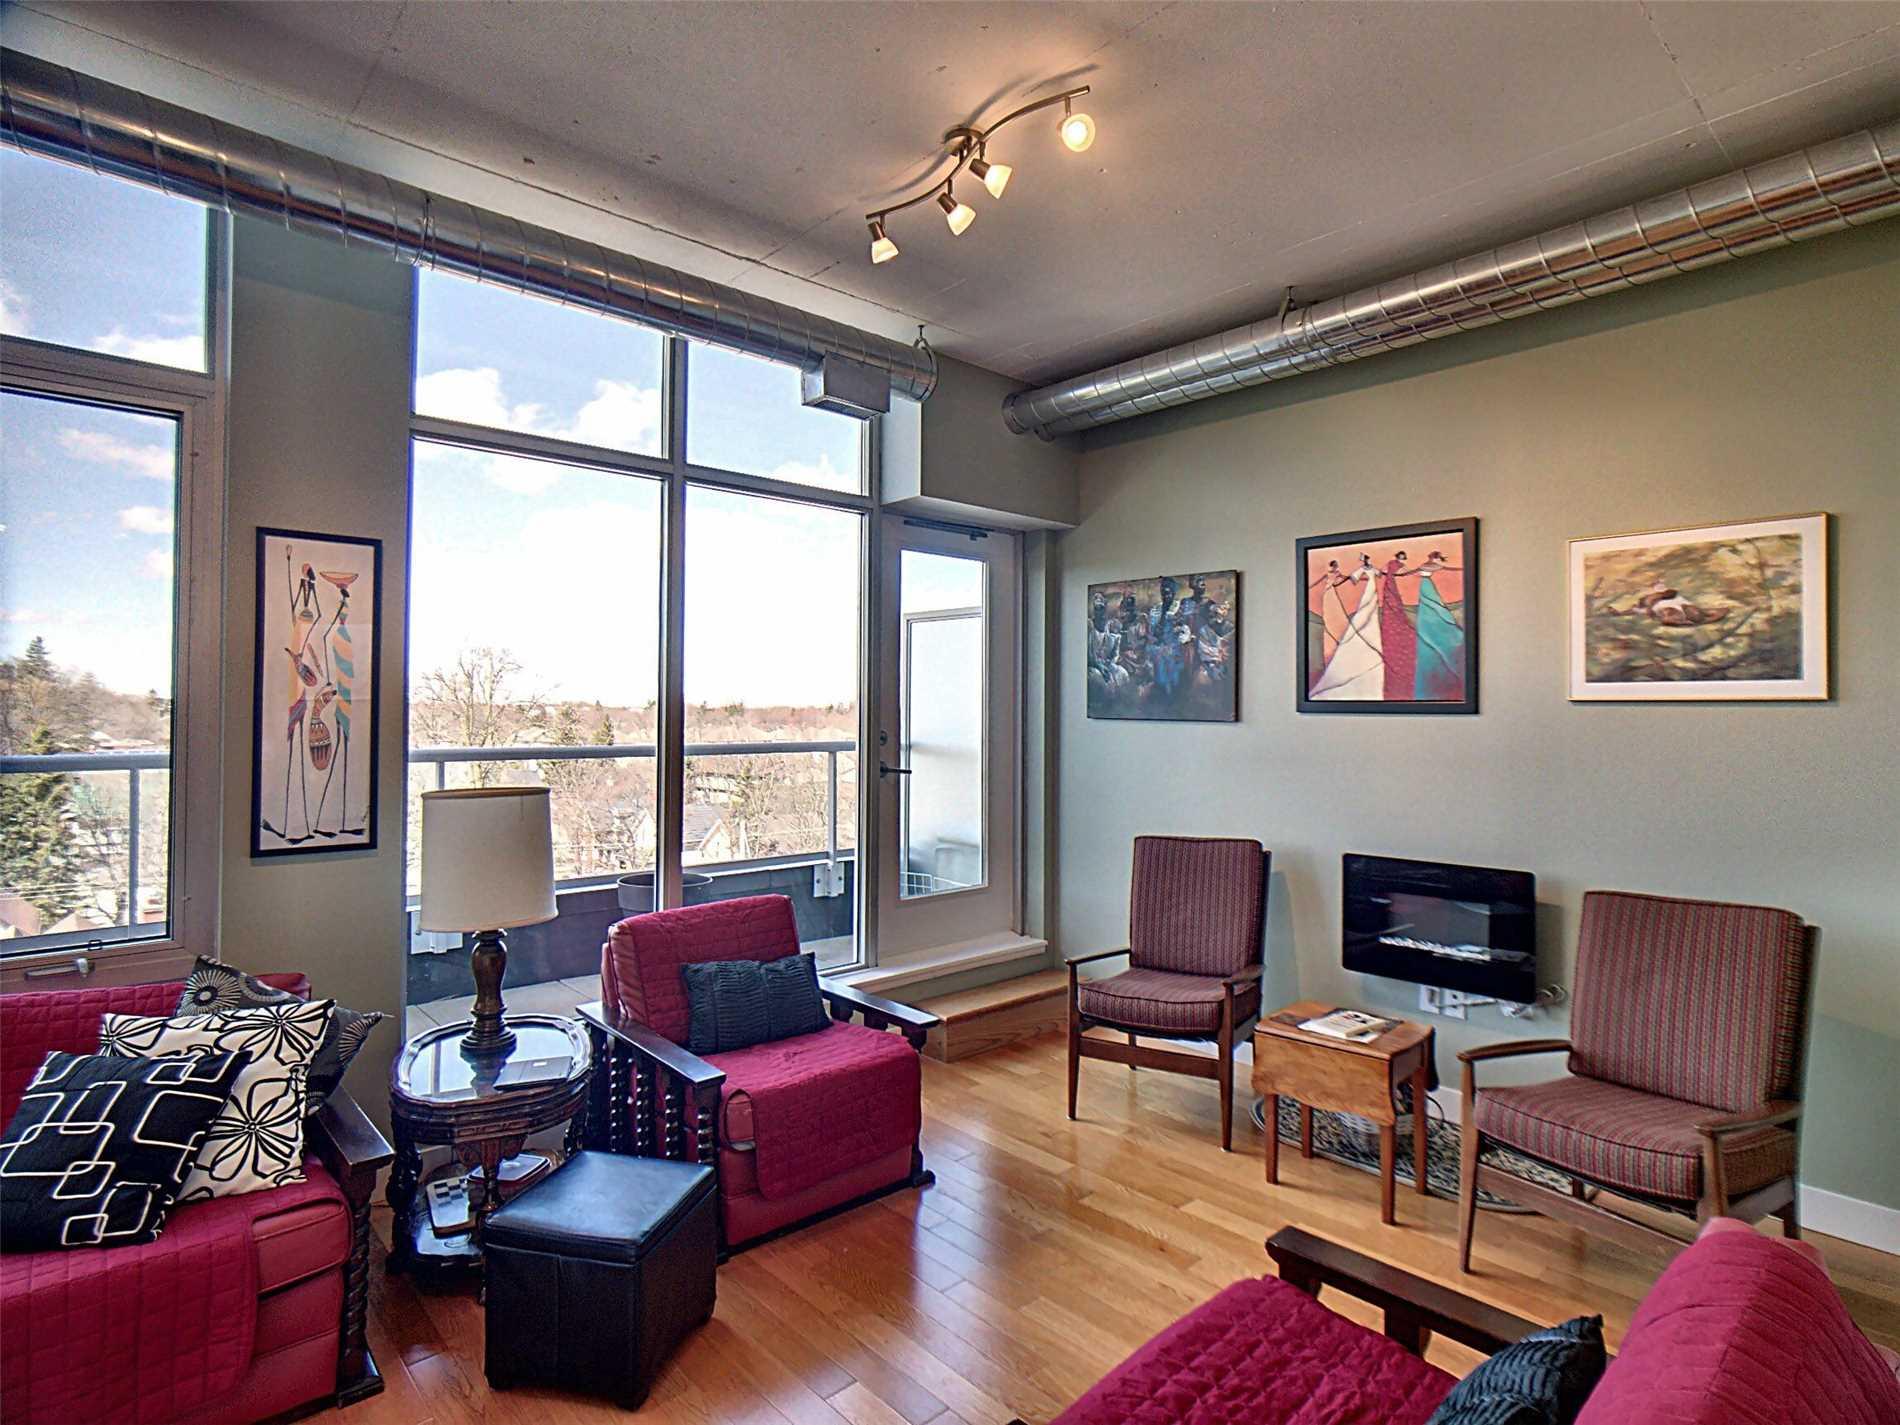 42 Bridgeport Rd E, Waterloo: MLS® # X4419625: Waterloo Real Estate